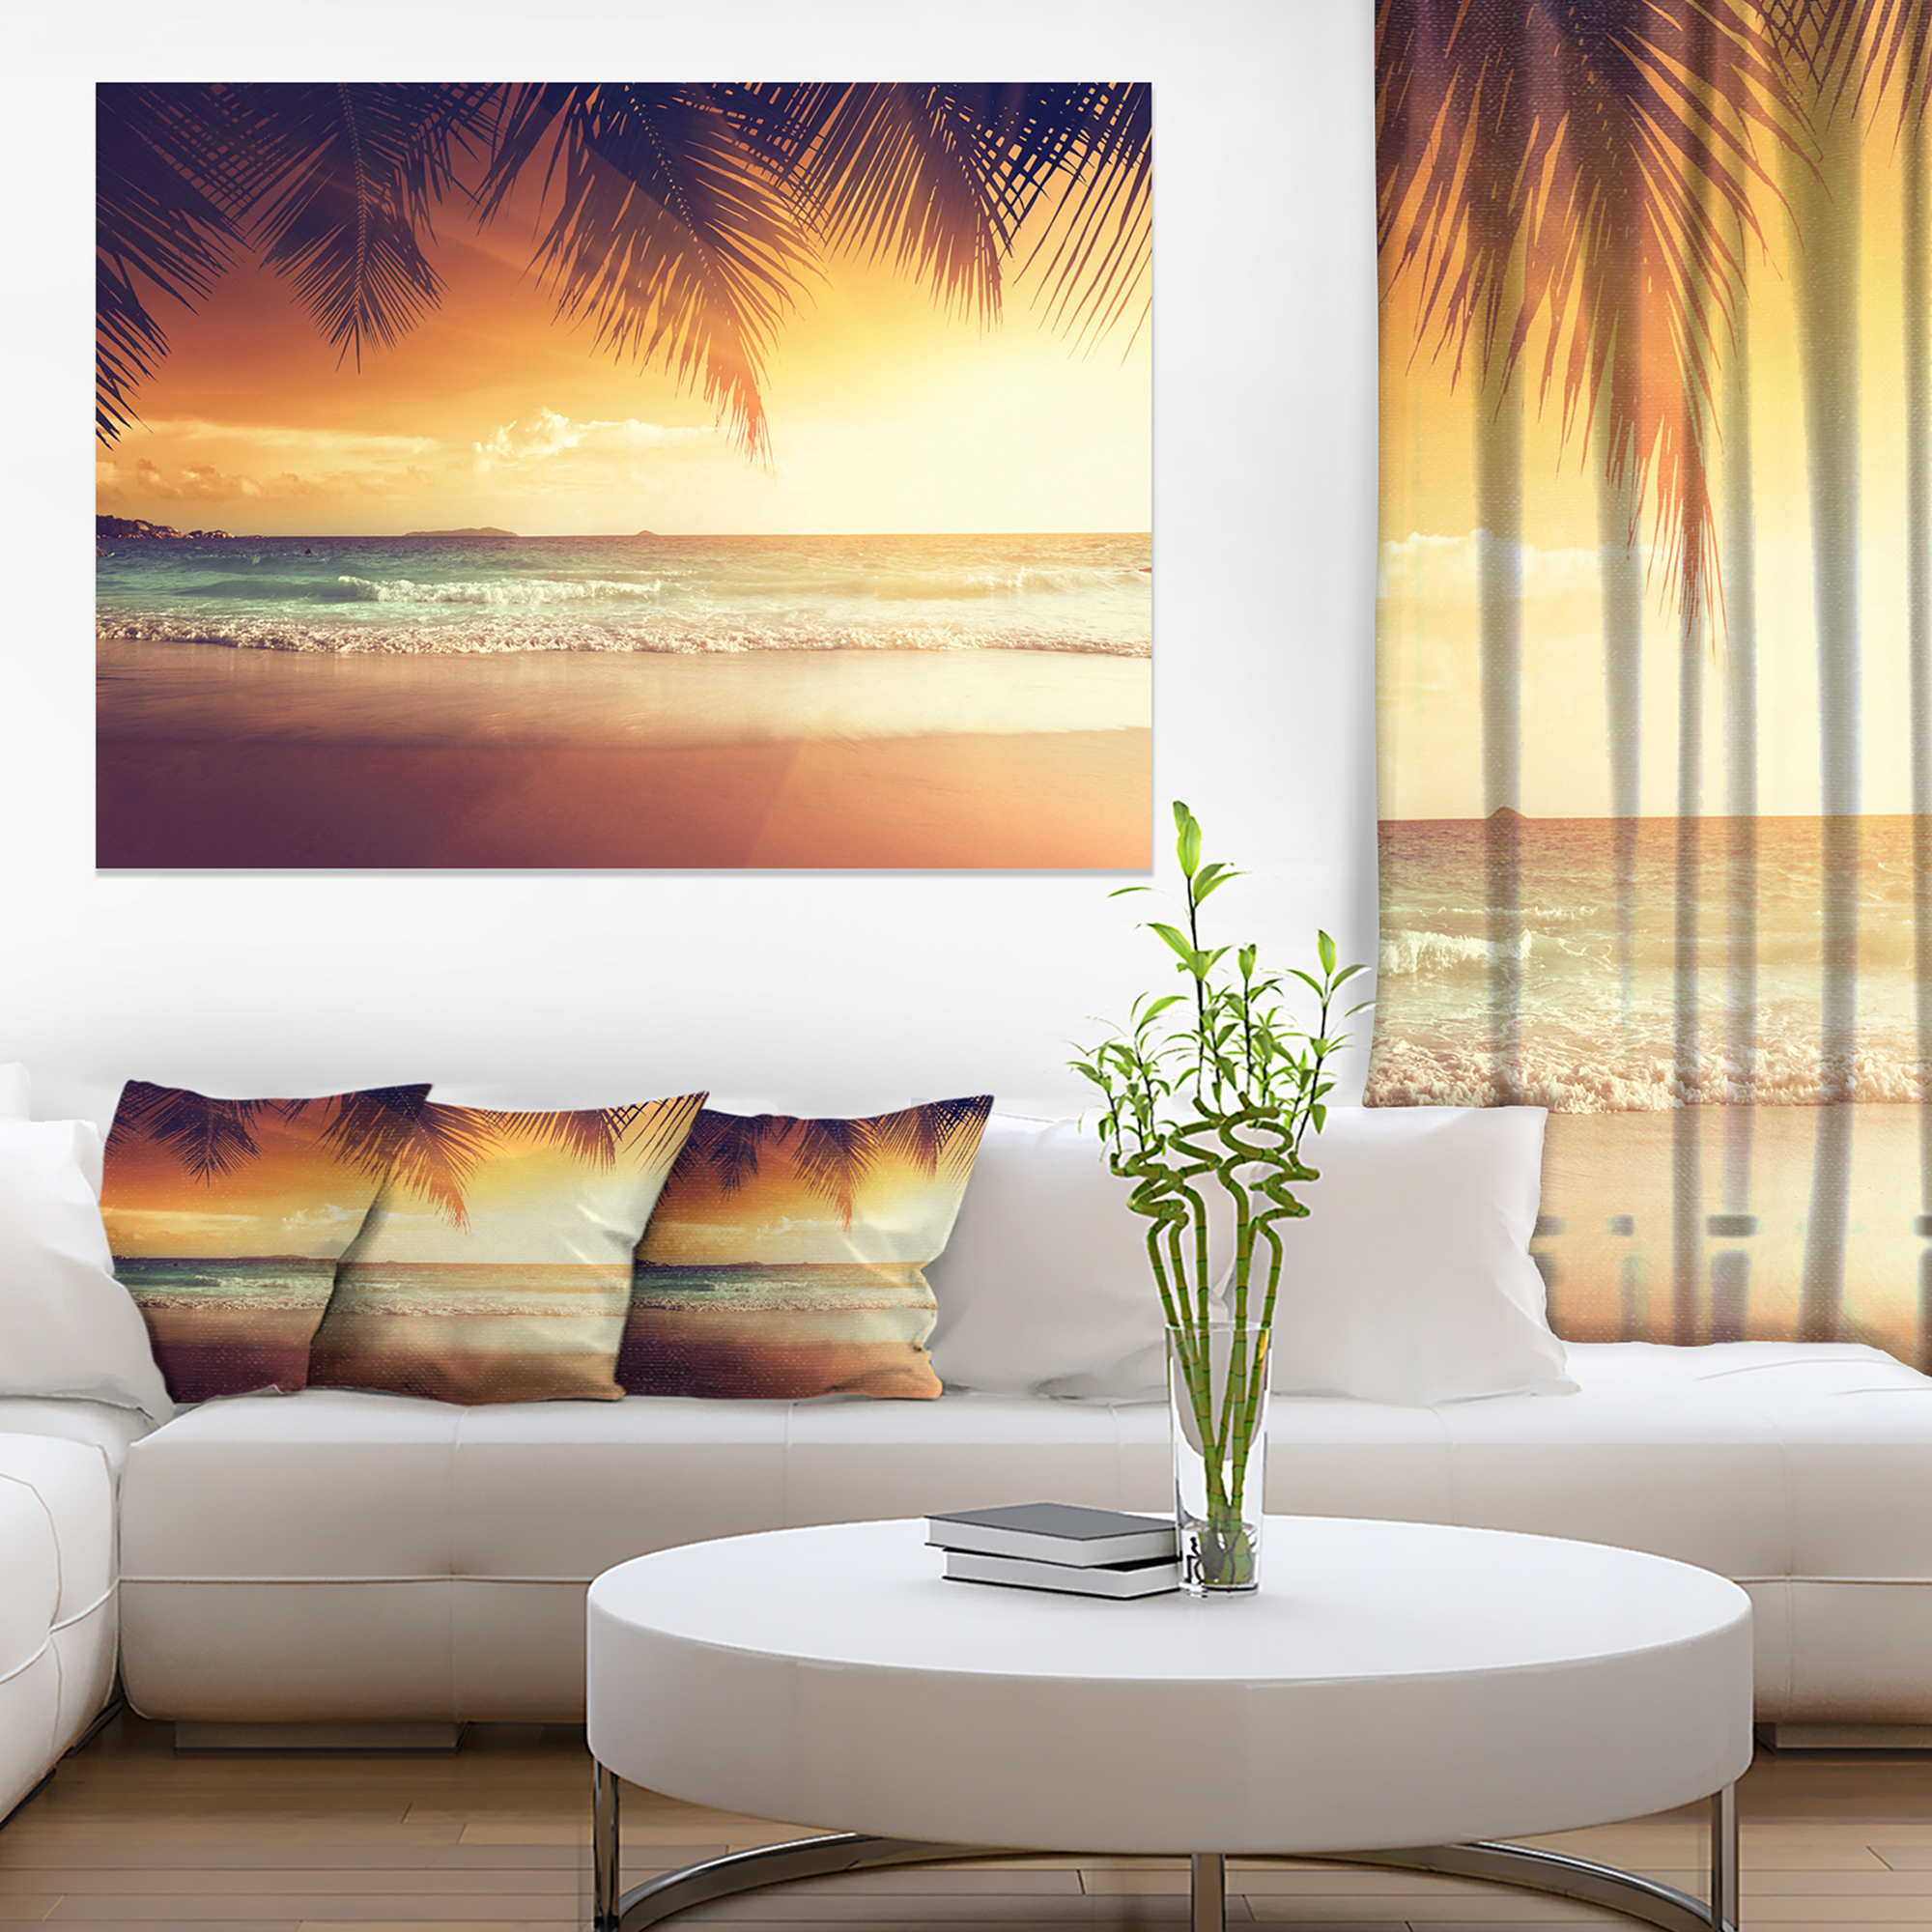 Design Art - Palm Leaves on Caribbean Seashore - image 3 of 3